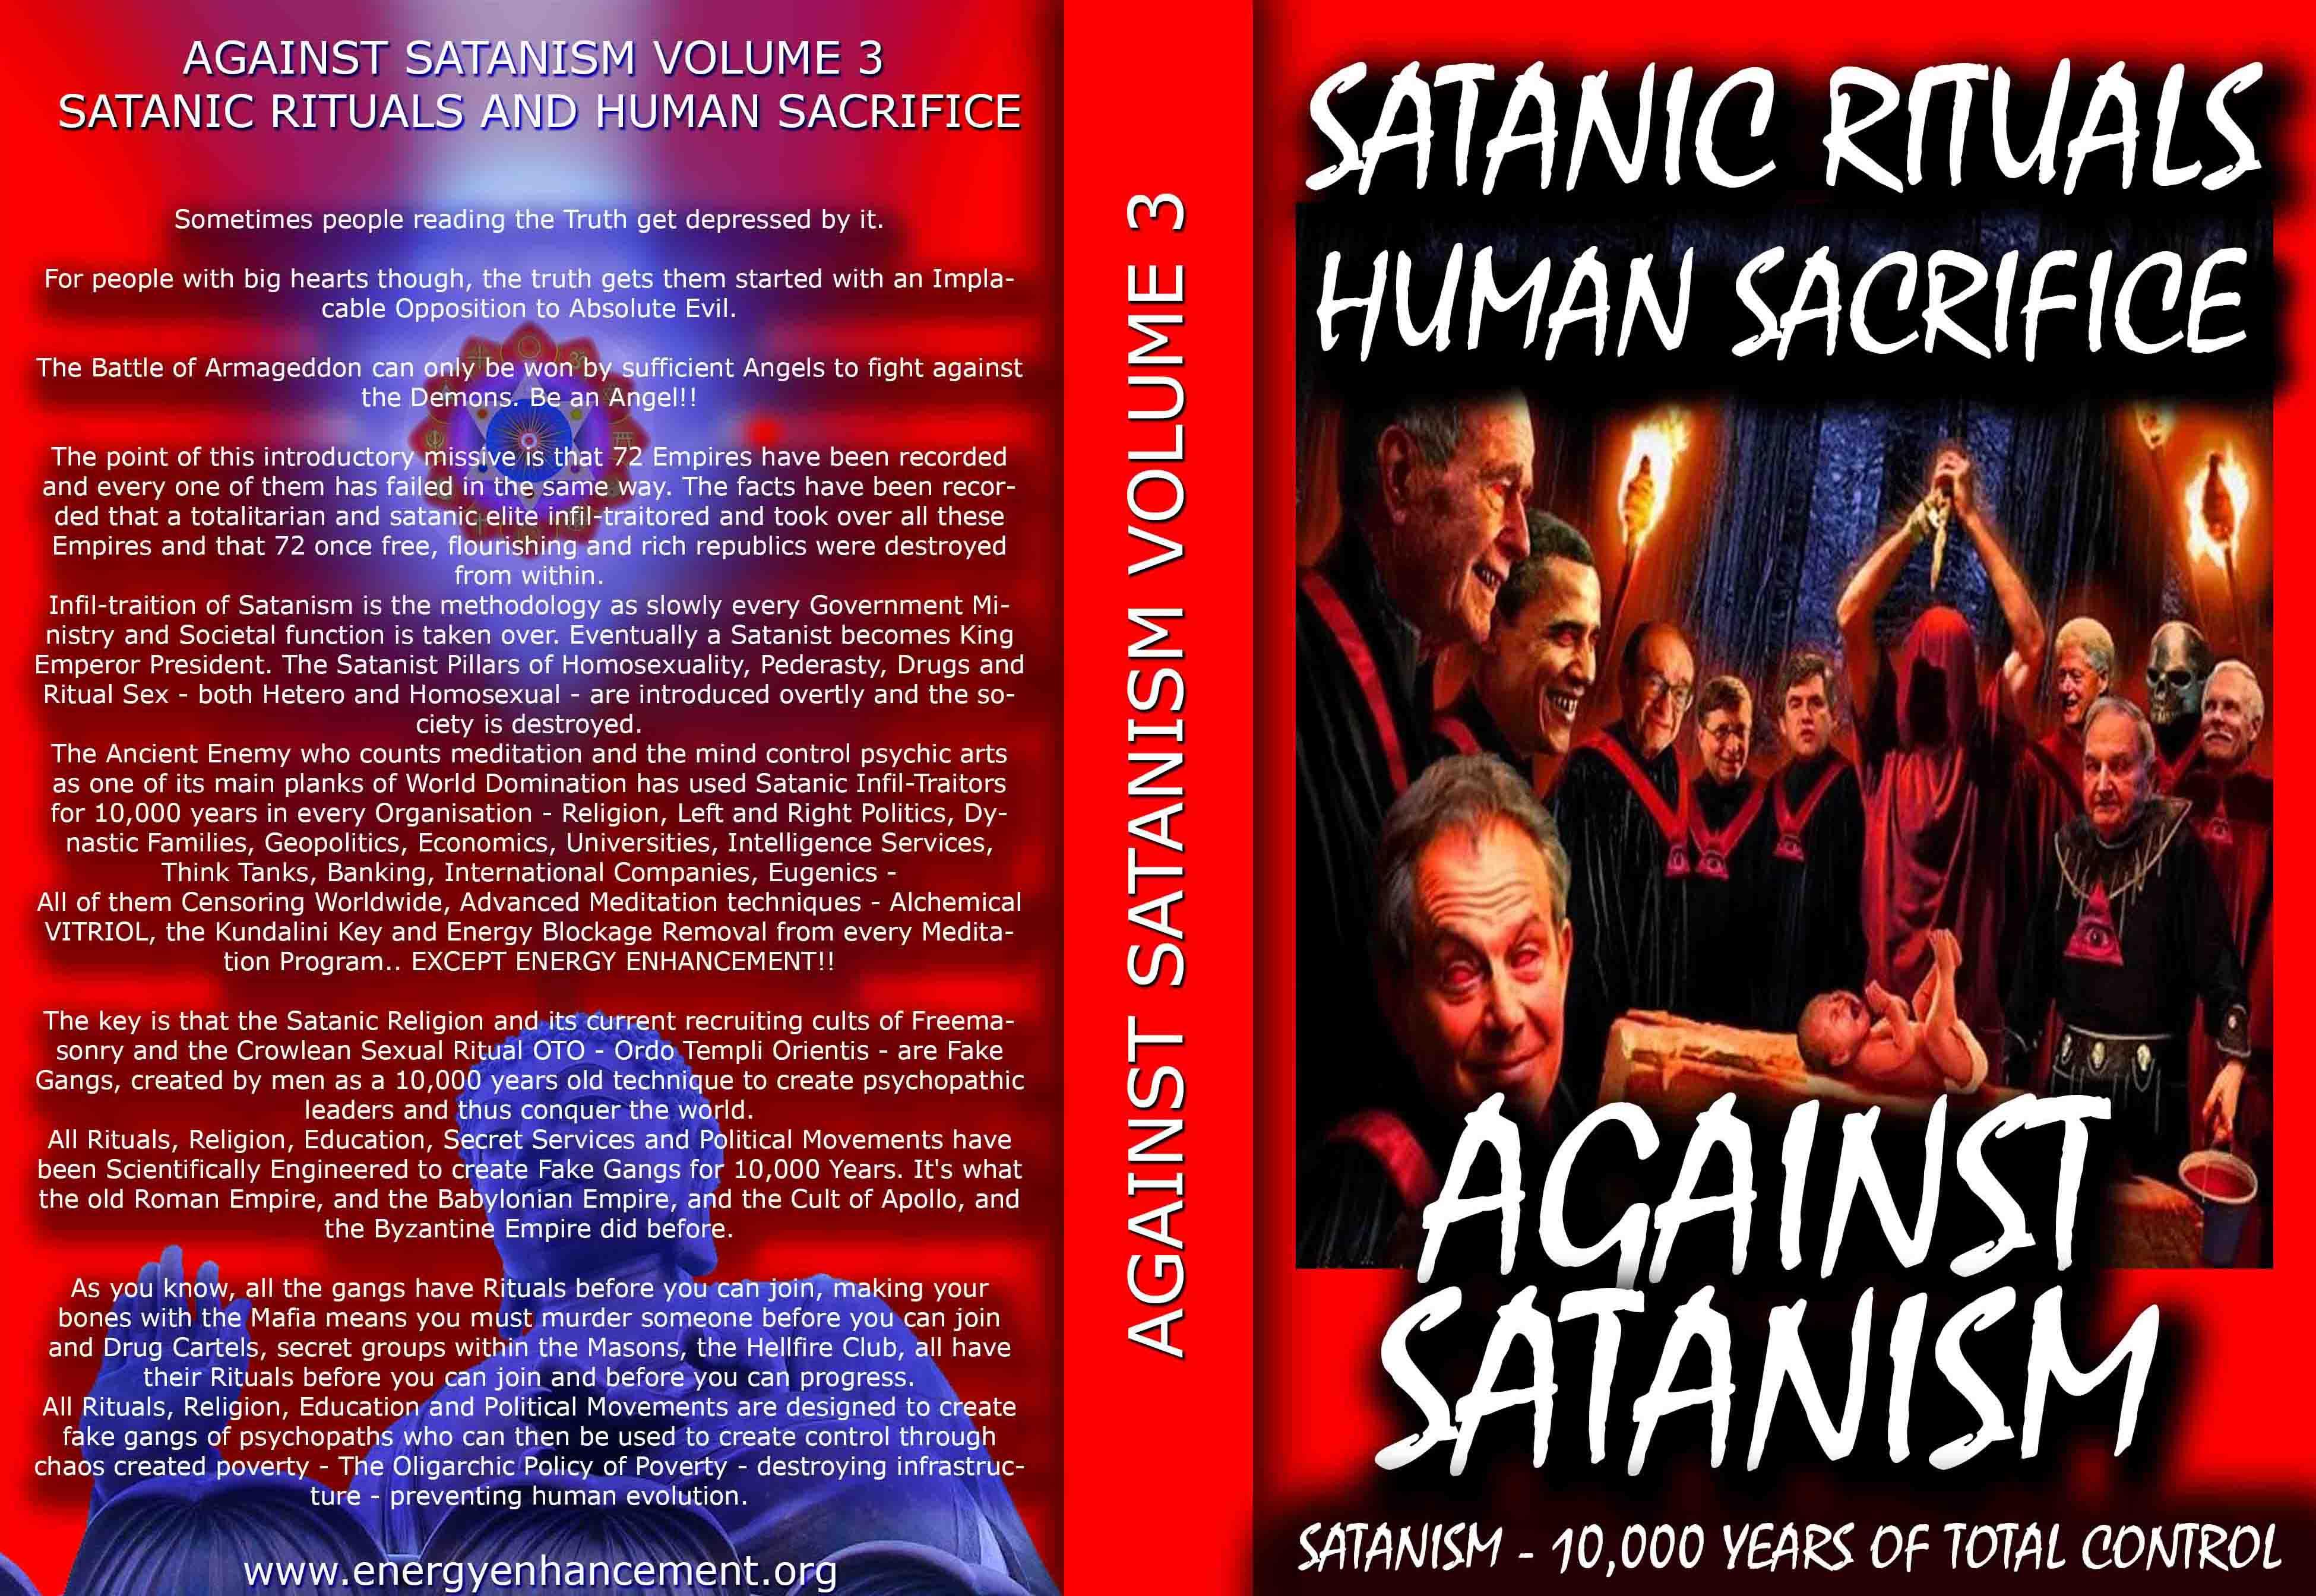 Description: Description: C:\wnew\Sacred-Energy\Against-Satanism-Volume-3\ANTI SATANIC 3.jpg